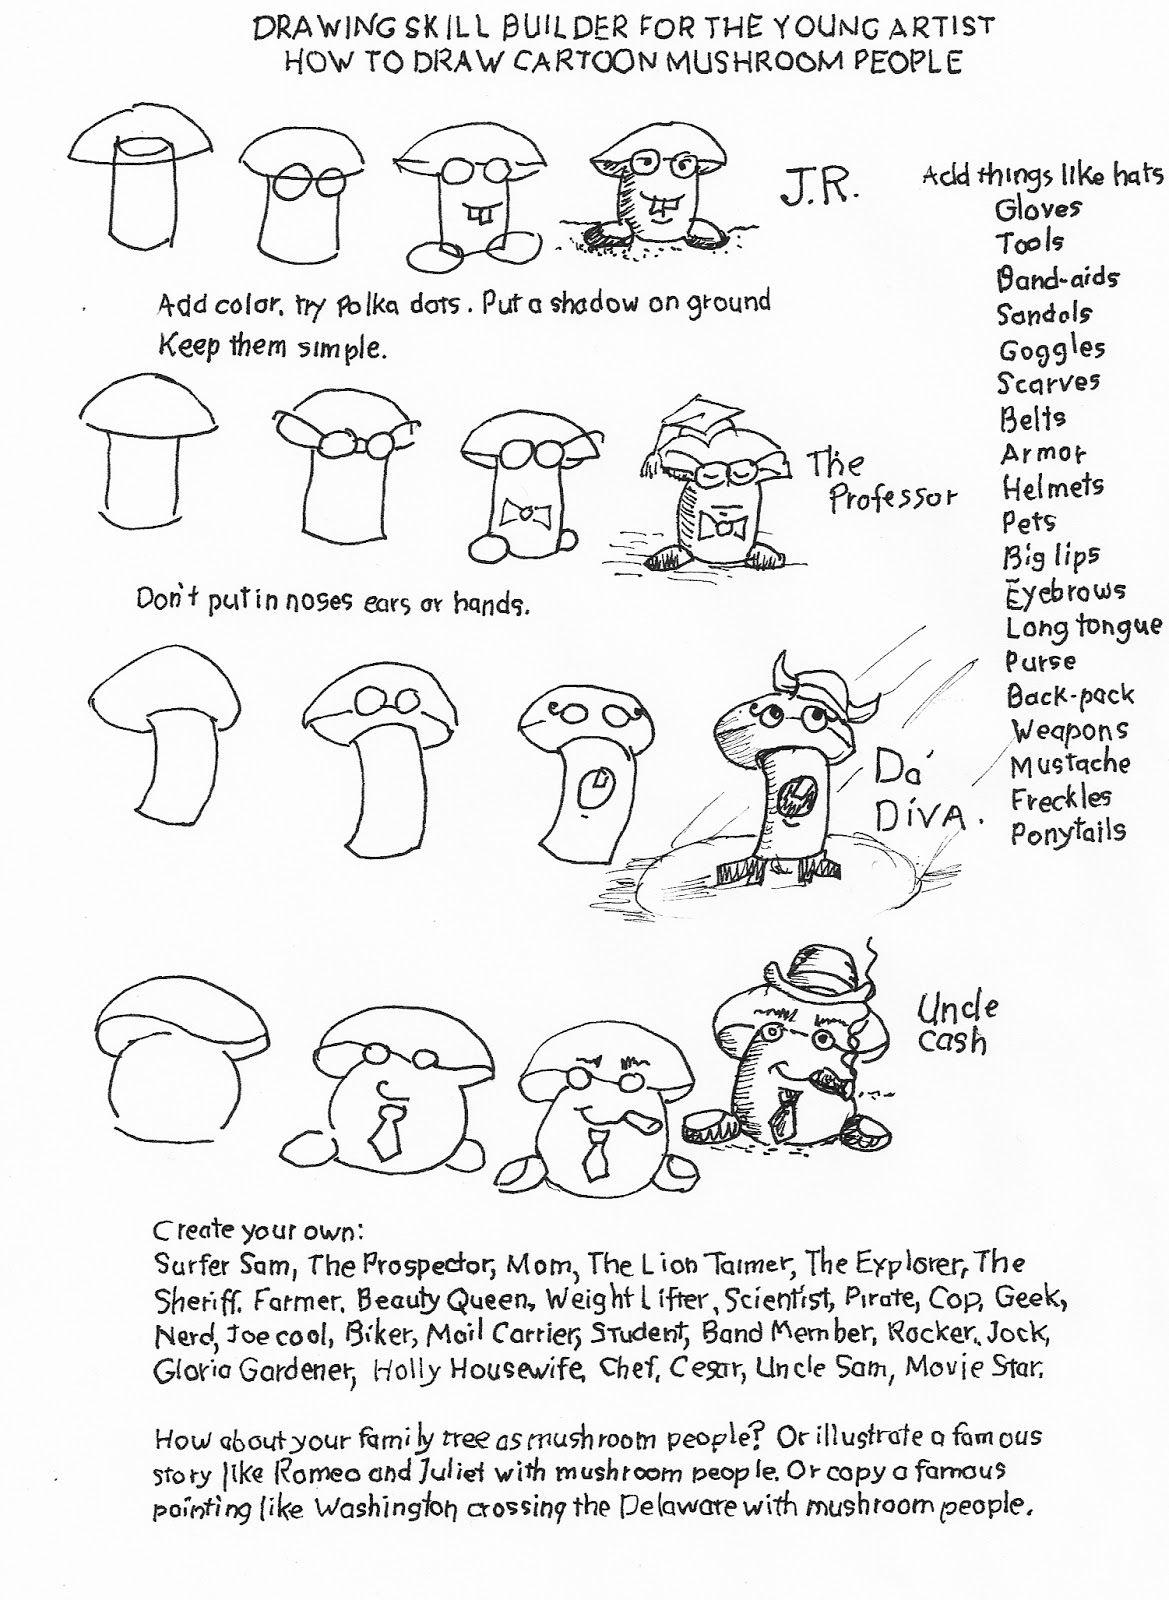 How To Draw Cartoon Mushroom People